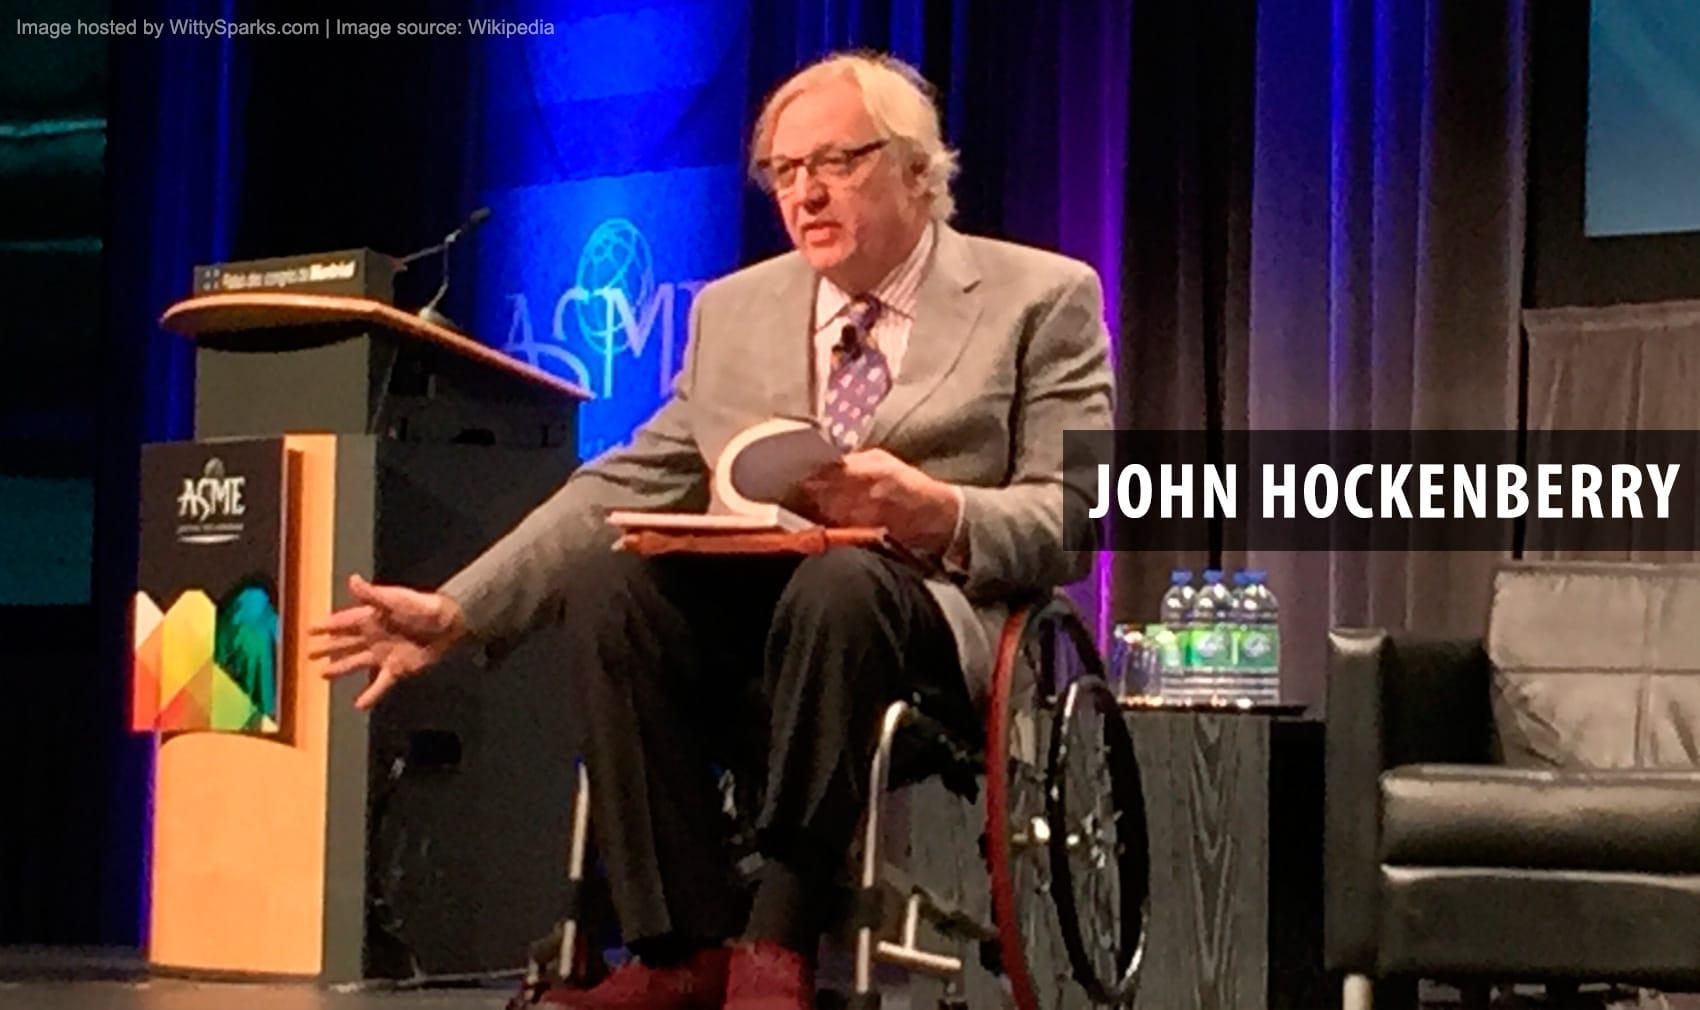 John Hockenberry